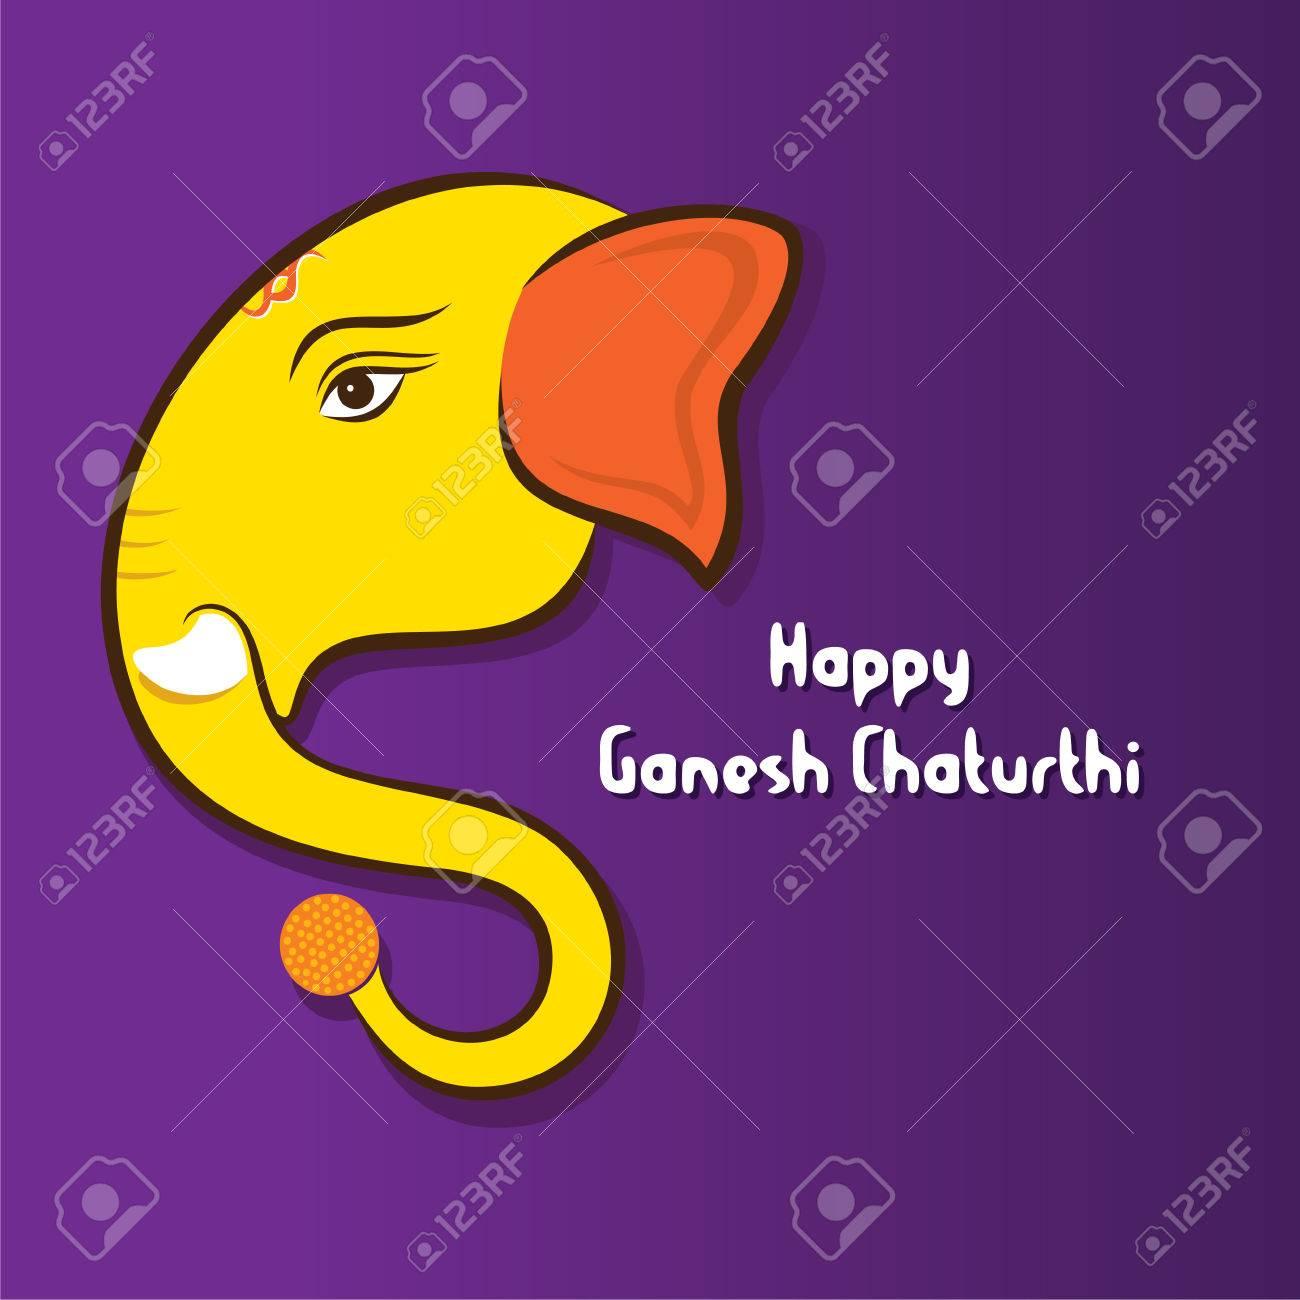 Happy Ganesha Chaturthi Festival Greeting Card Design Vector Royalty